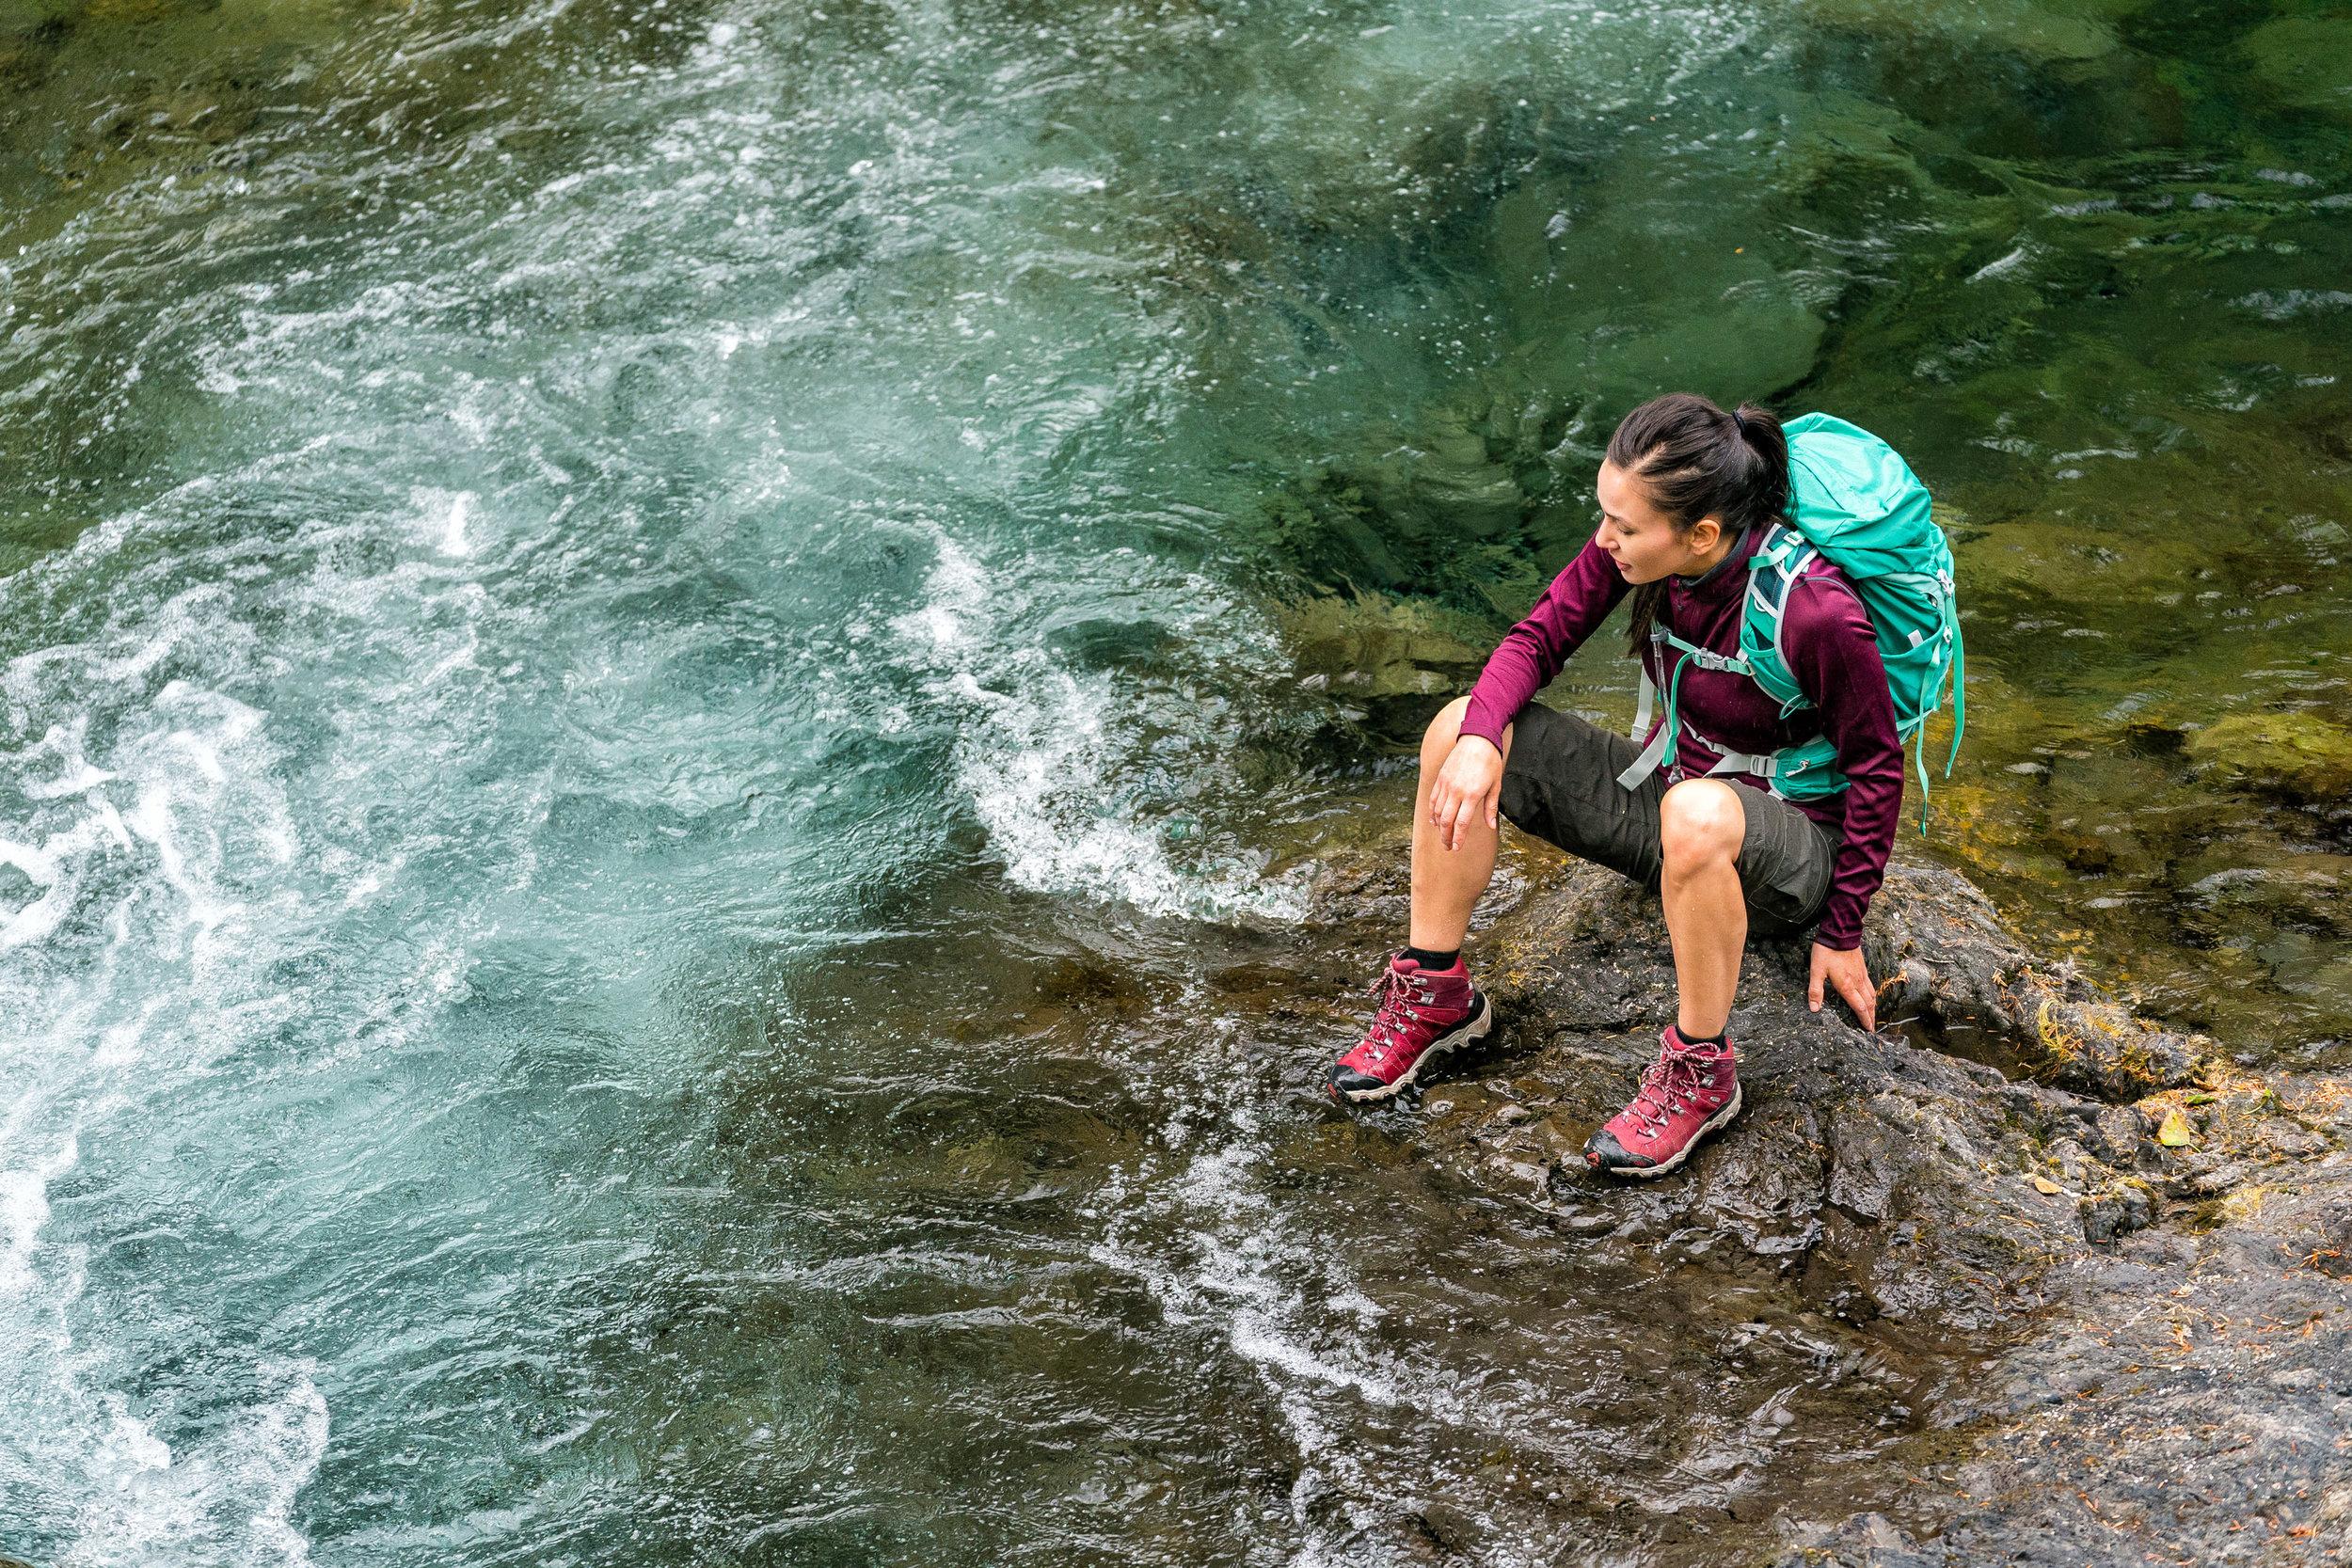 Adventure: Hiking in Olympic National Park in summertime, Mt. Rainier National Park, Washington